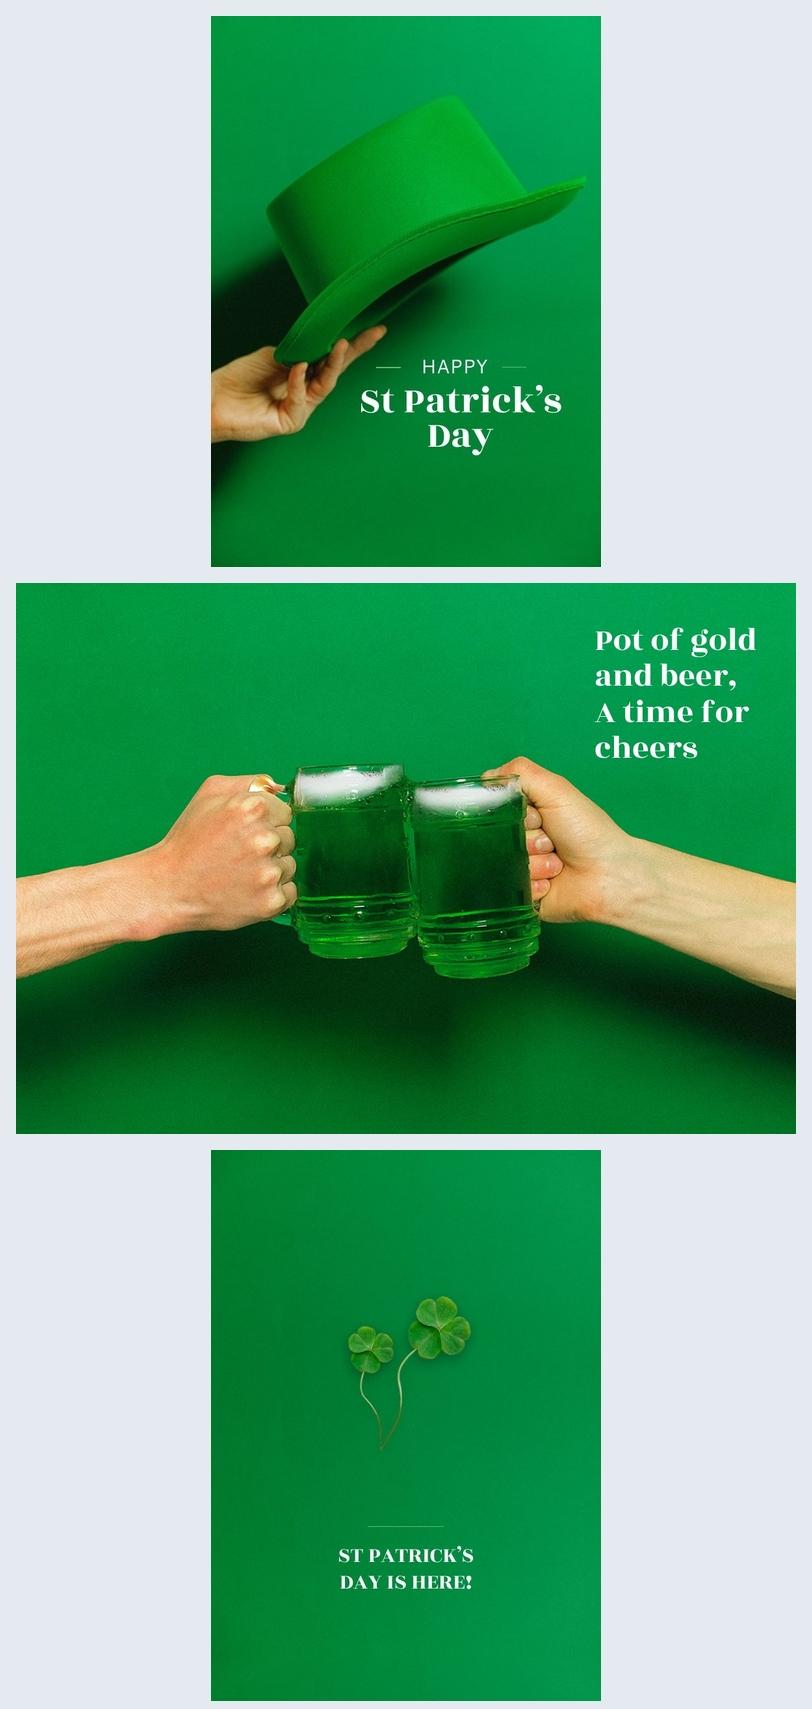 Idée de carte joyeuse Saint Patrick